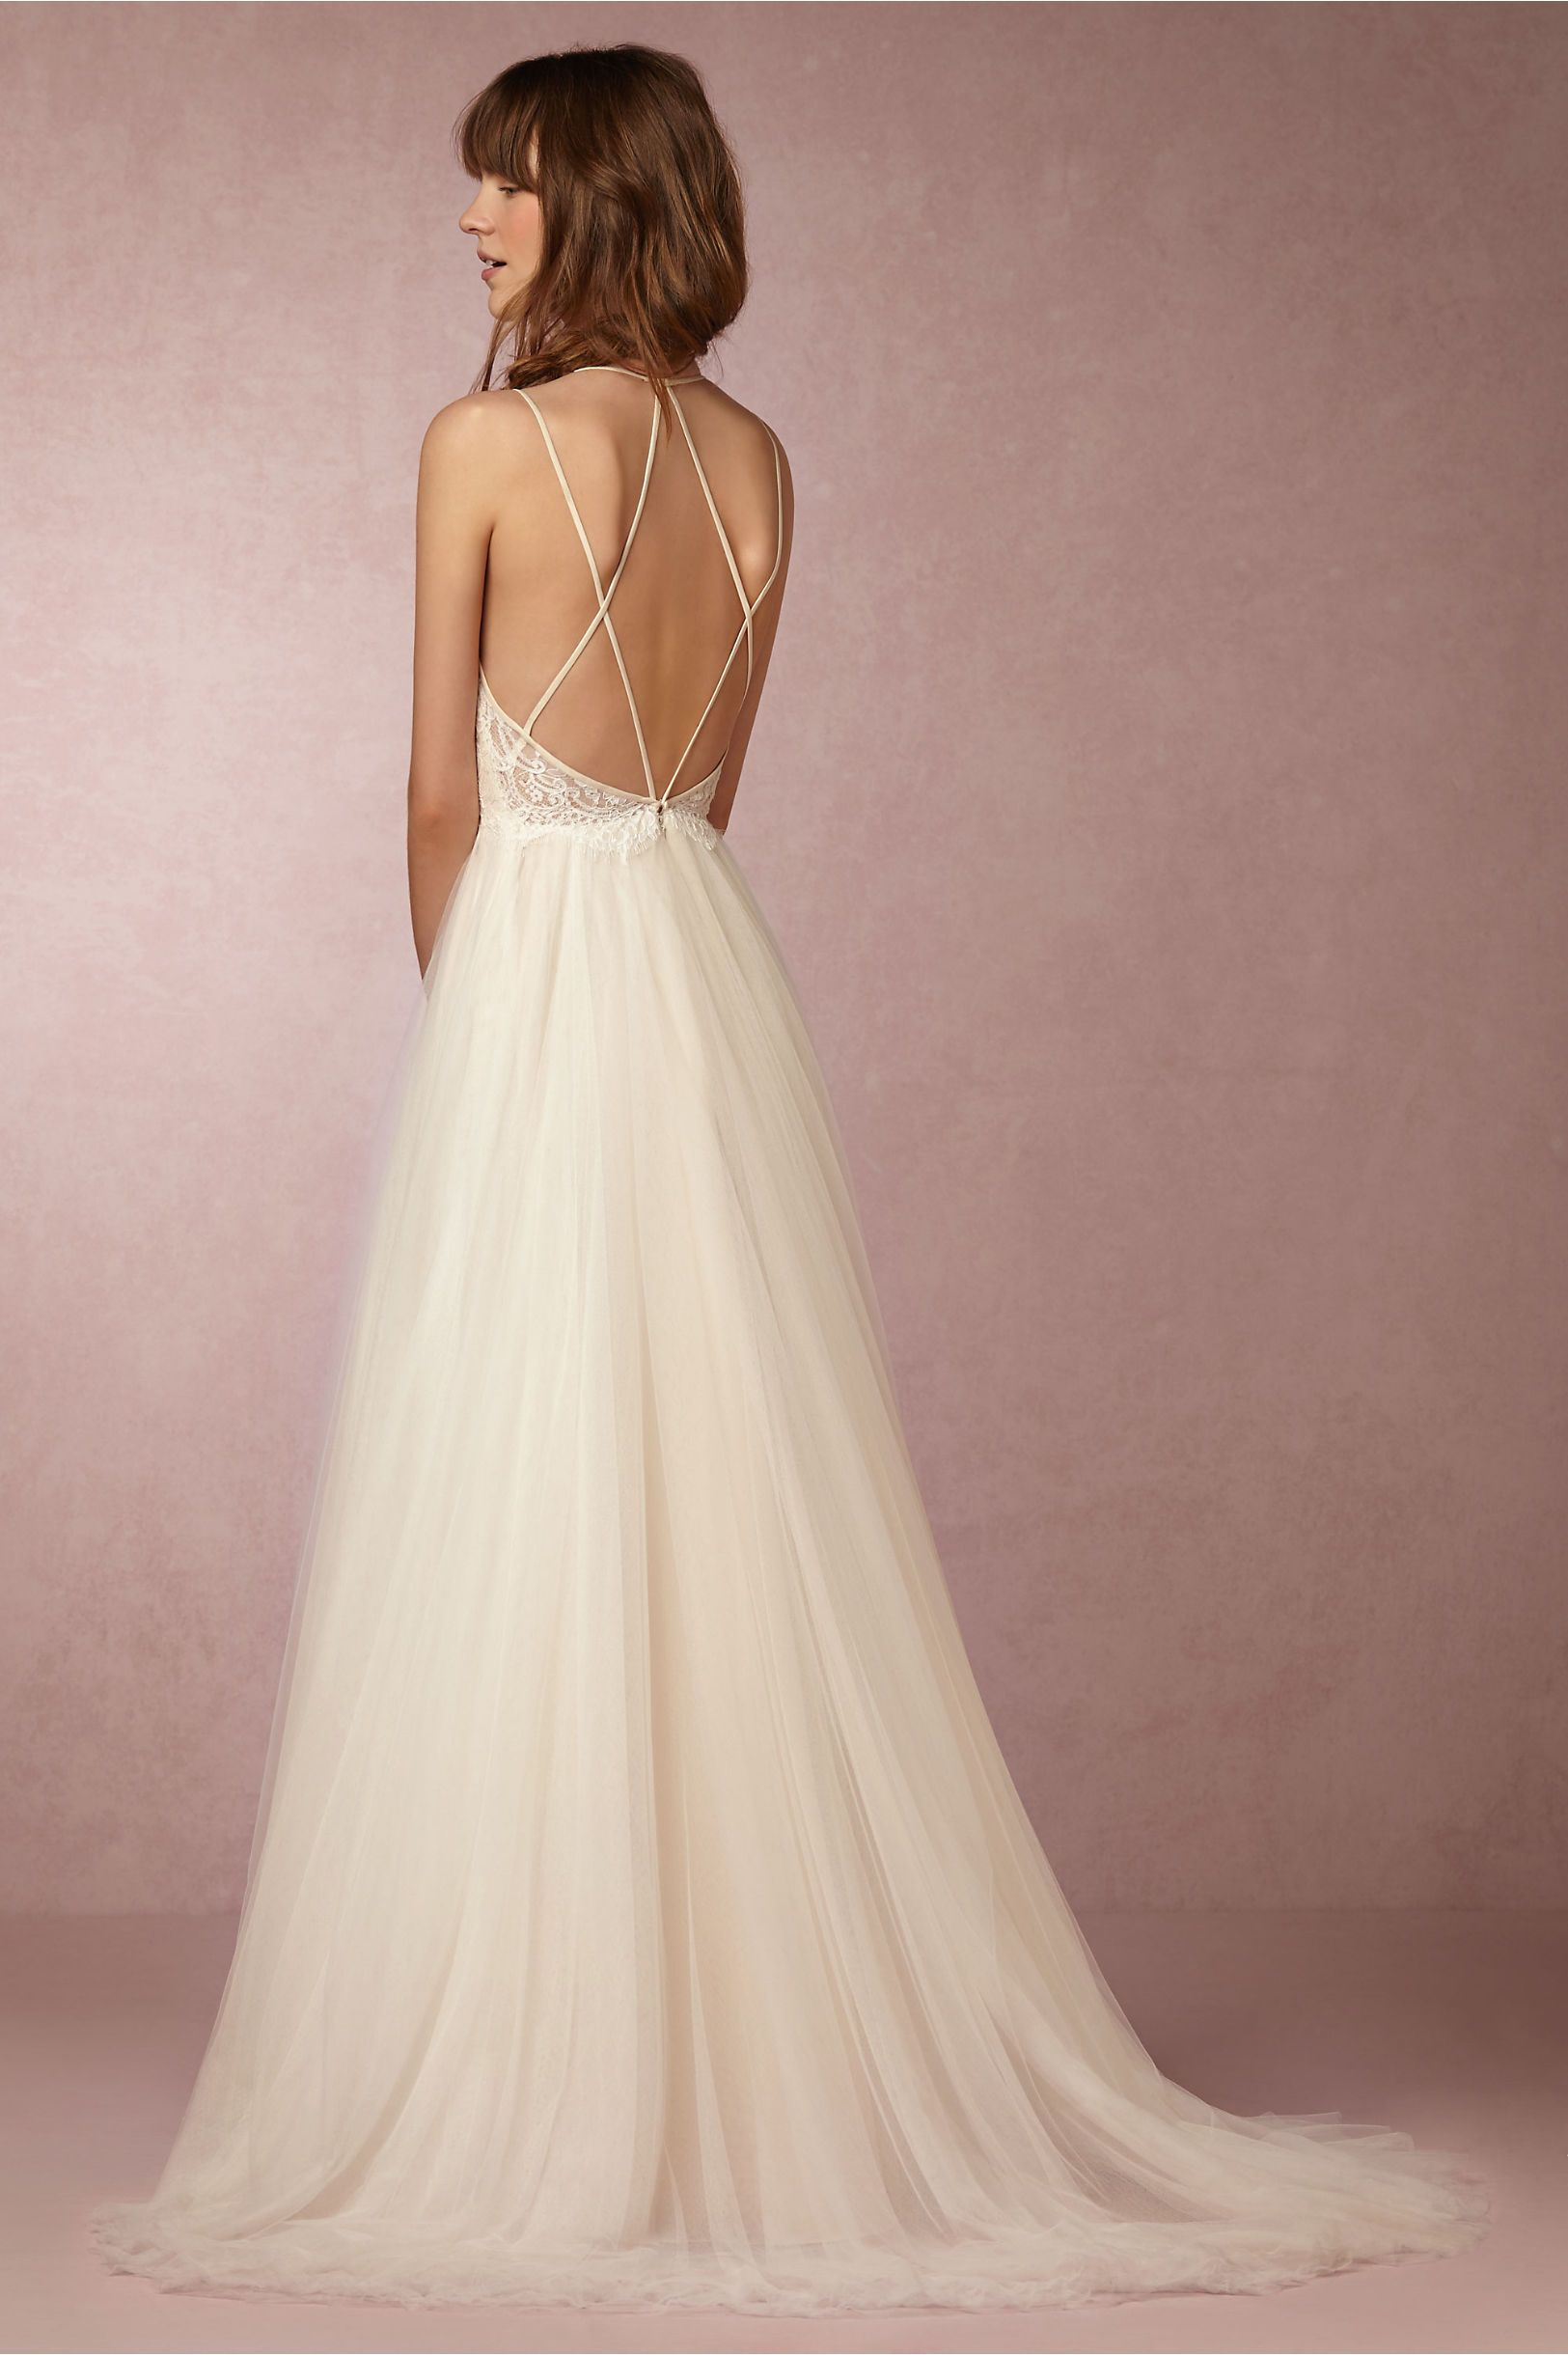 Rosalind gown wedding pinterest wedding dresses wedding and